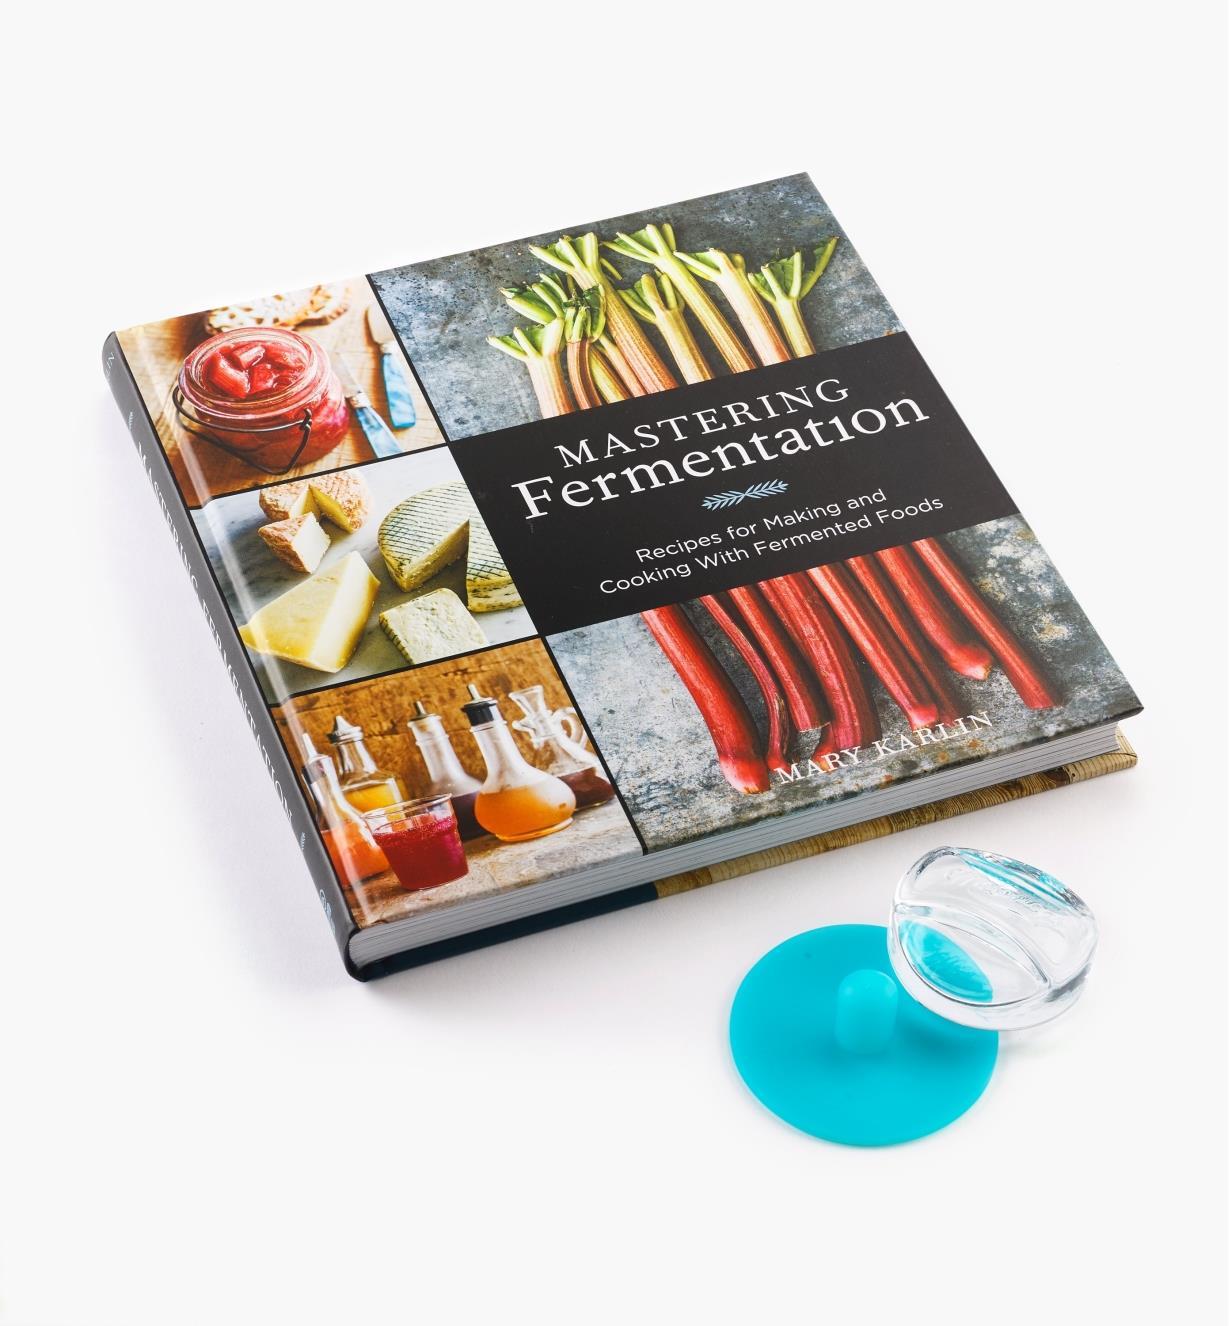 EV393 - Fermenting for Beginners w/Fermentation Set for Regular-Mouth Jars